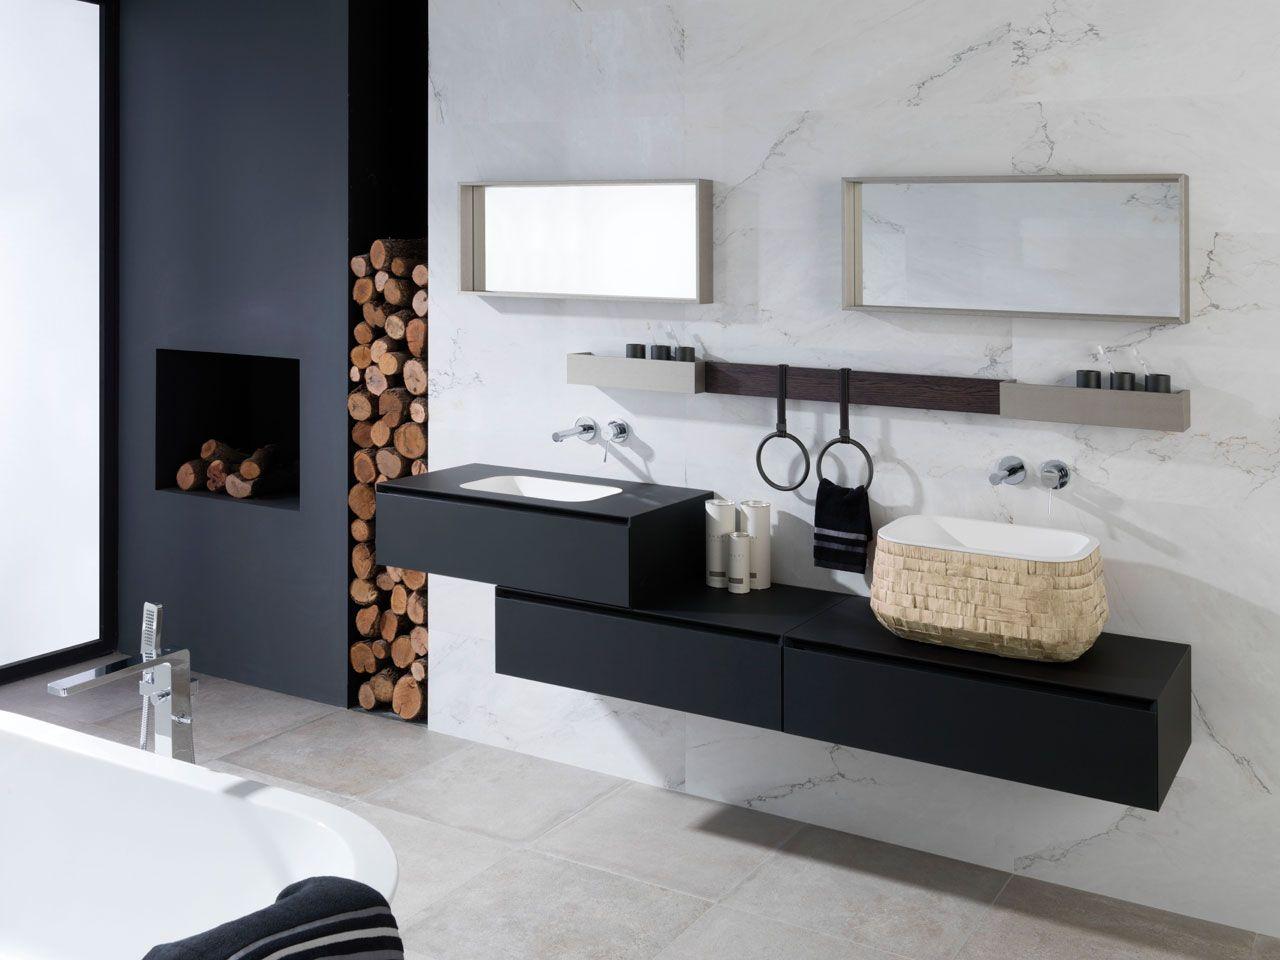 Modular Bathroom Cabinets soft negro ghost / roble noche   bathrooms   pinterest   bathroom